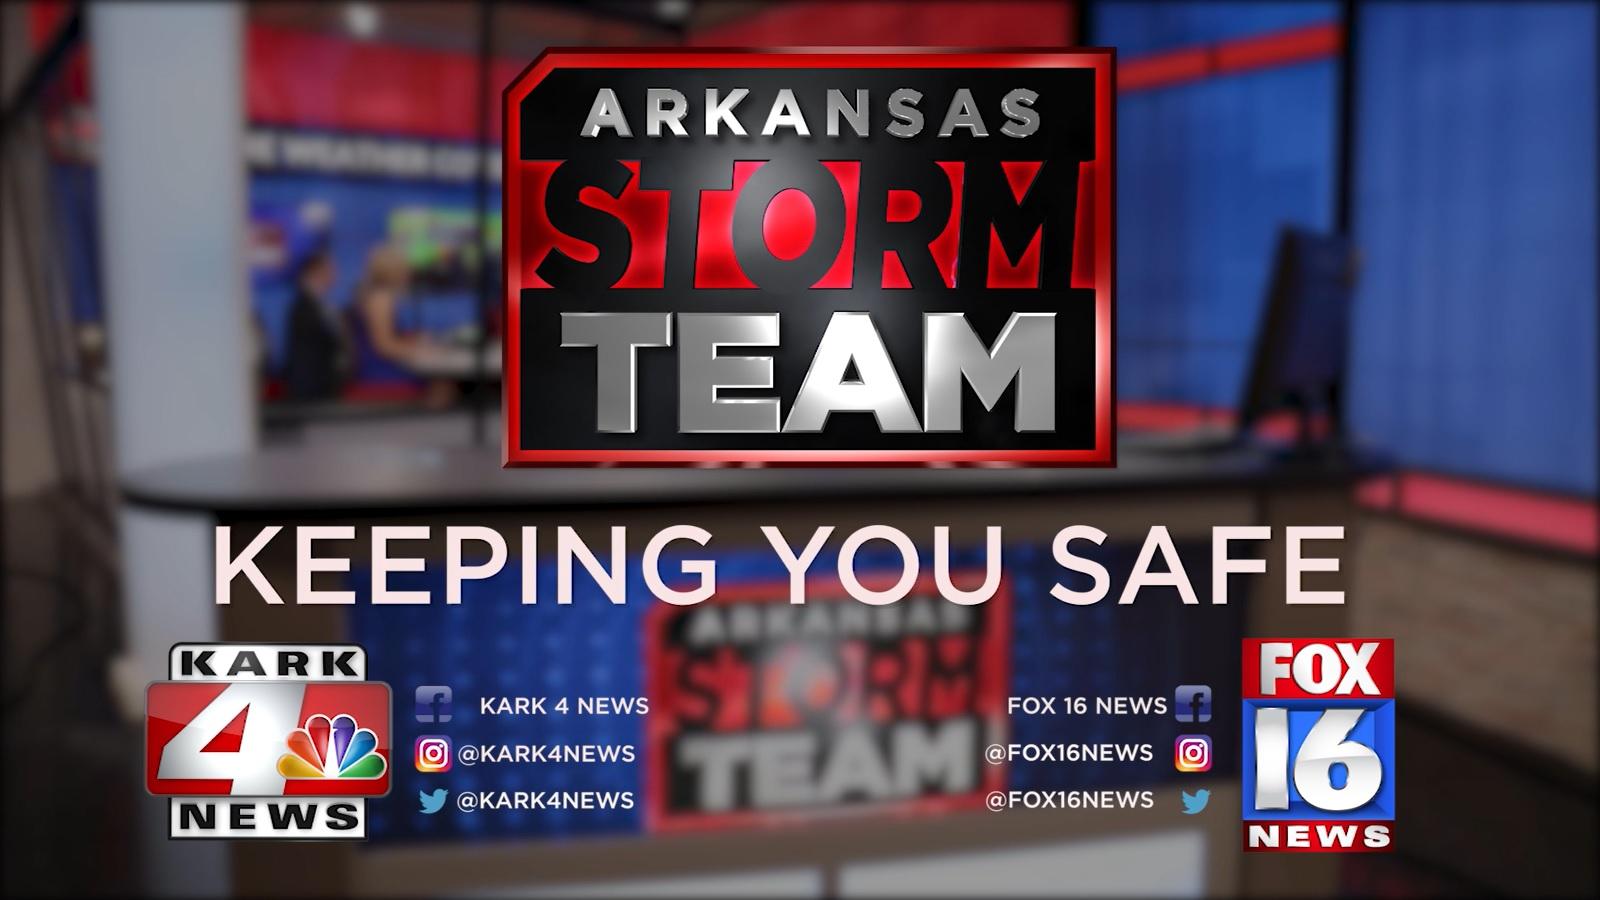 arkansas storm team generic_1550837526449.jpg-118809306.jpg